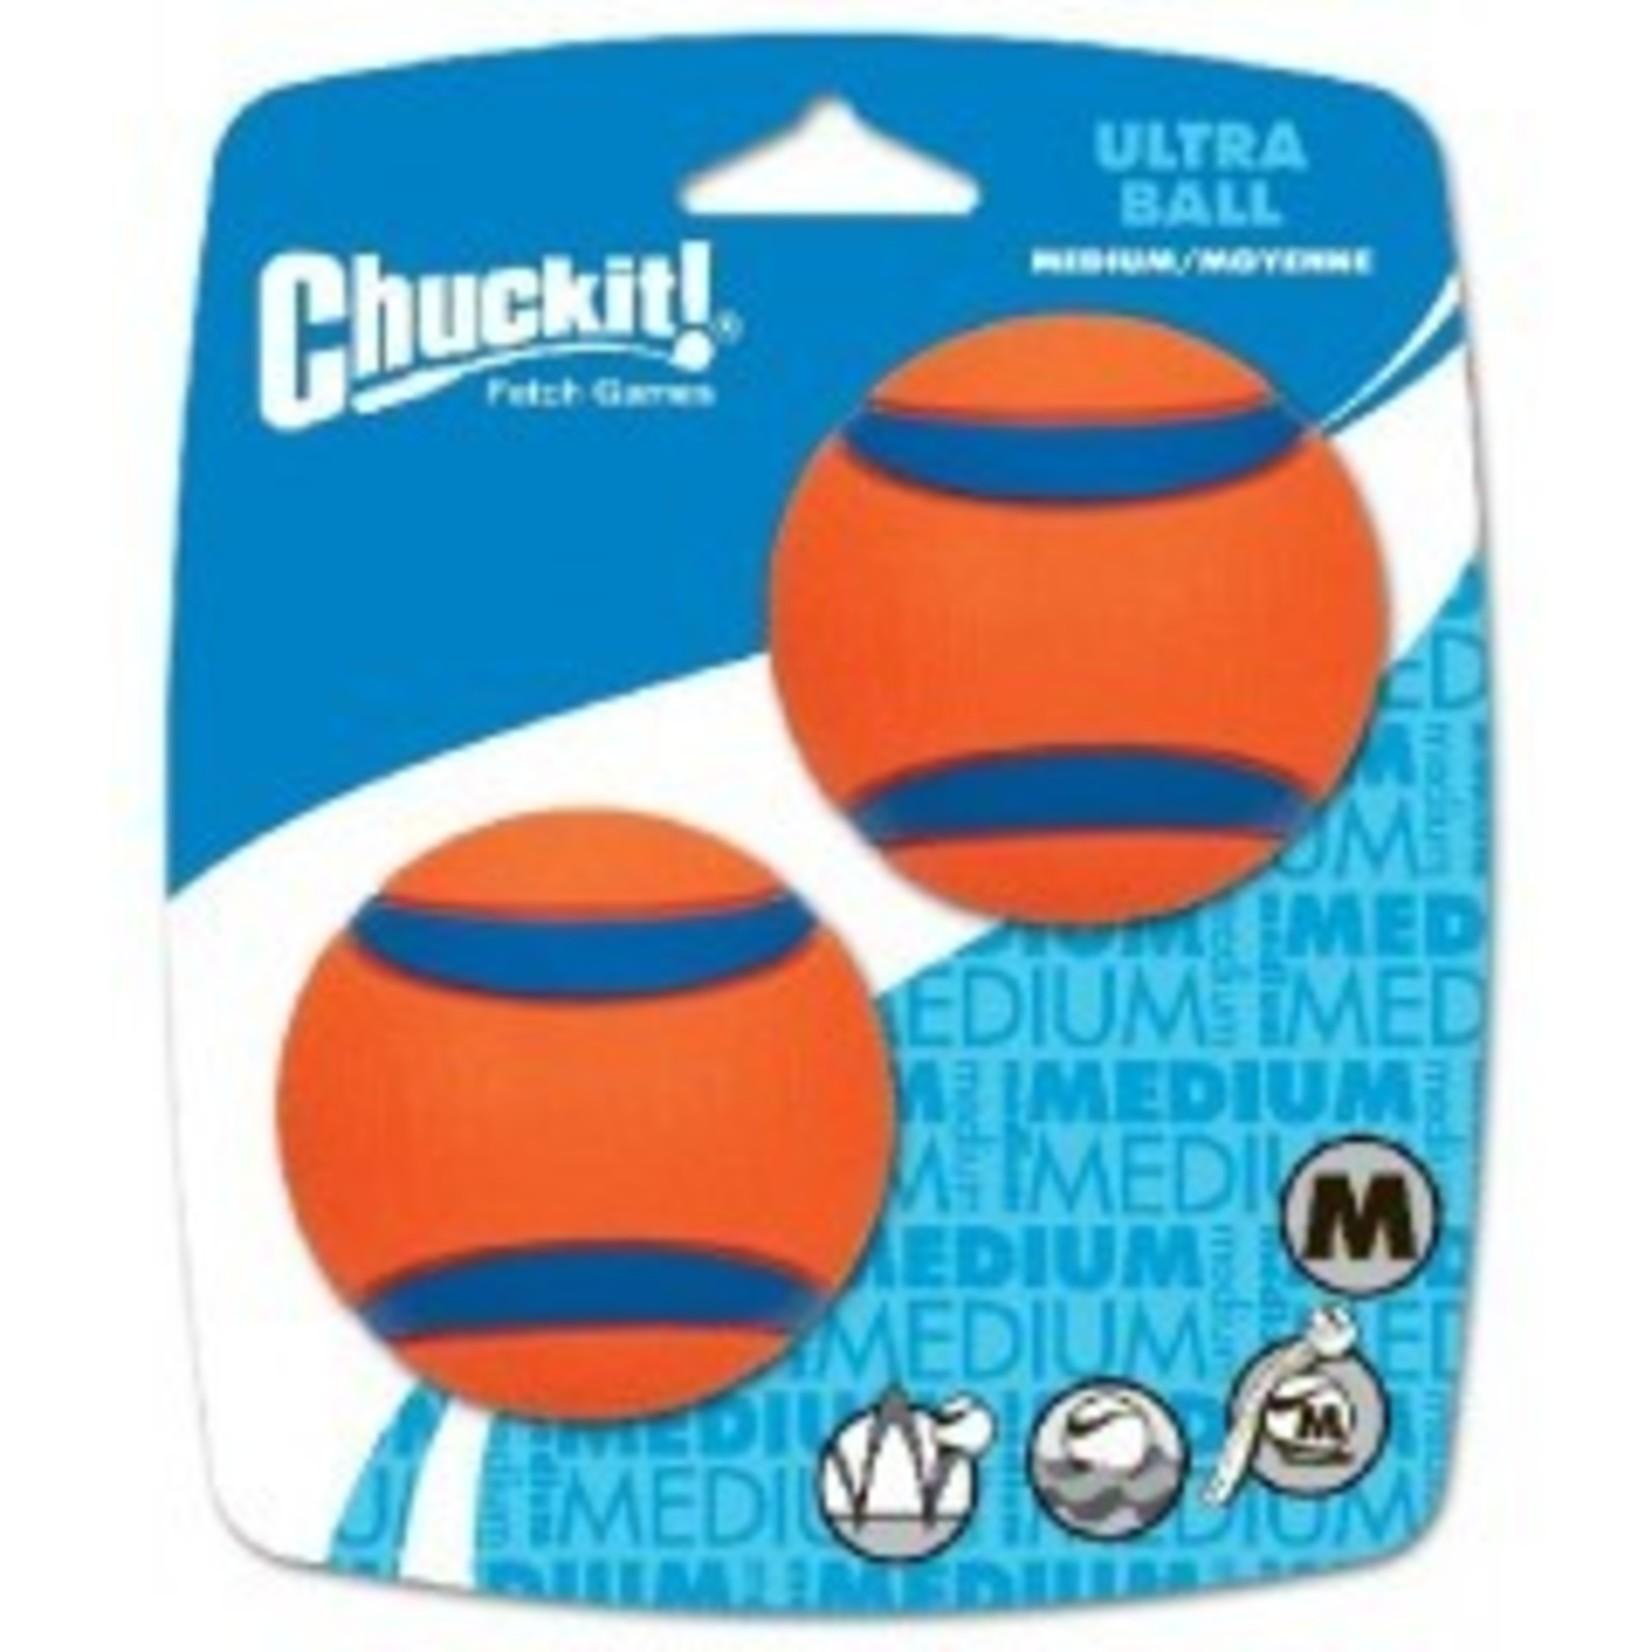 Chuckit Chuckit Ultra Ball medium. 2 pack